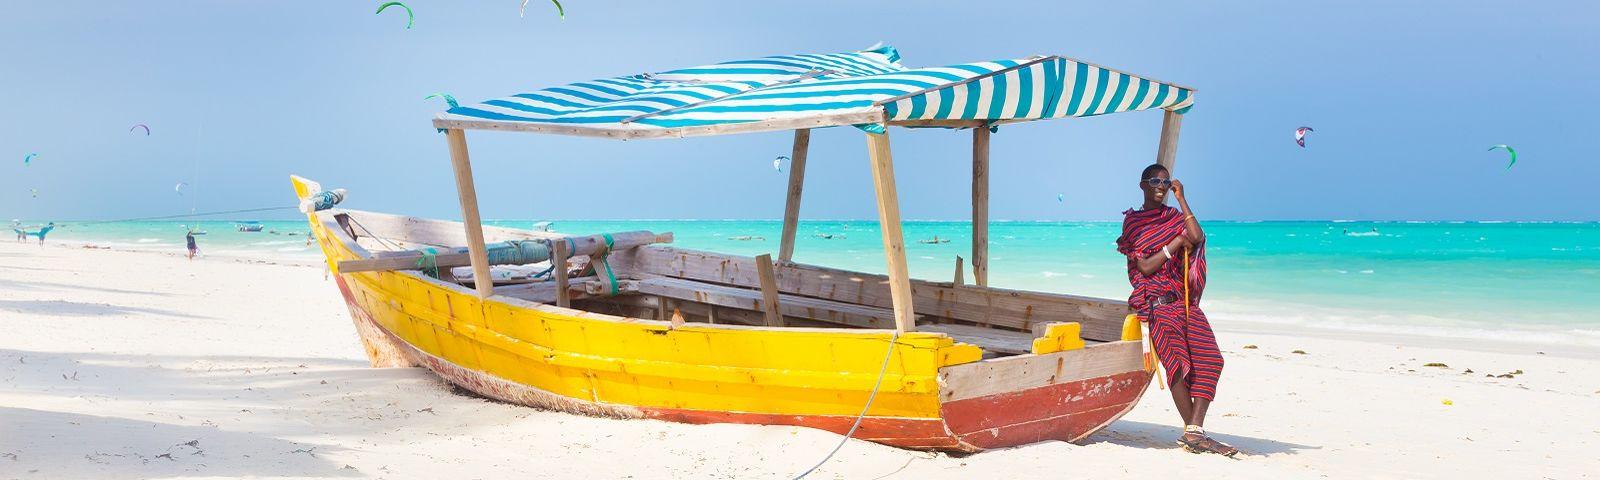 Maasai lounging at the beach - Things to do in Zanzibar